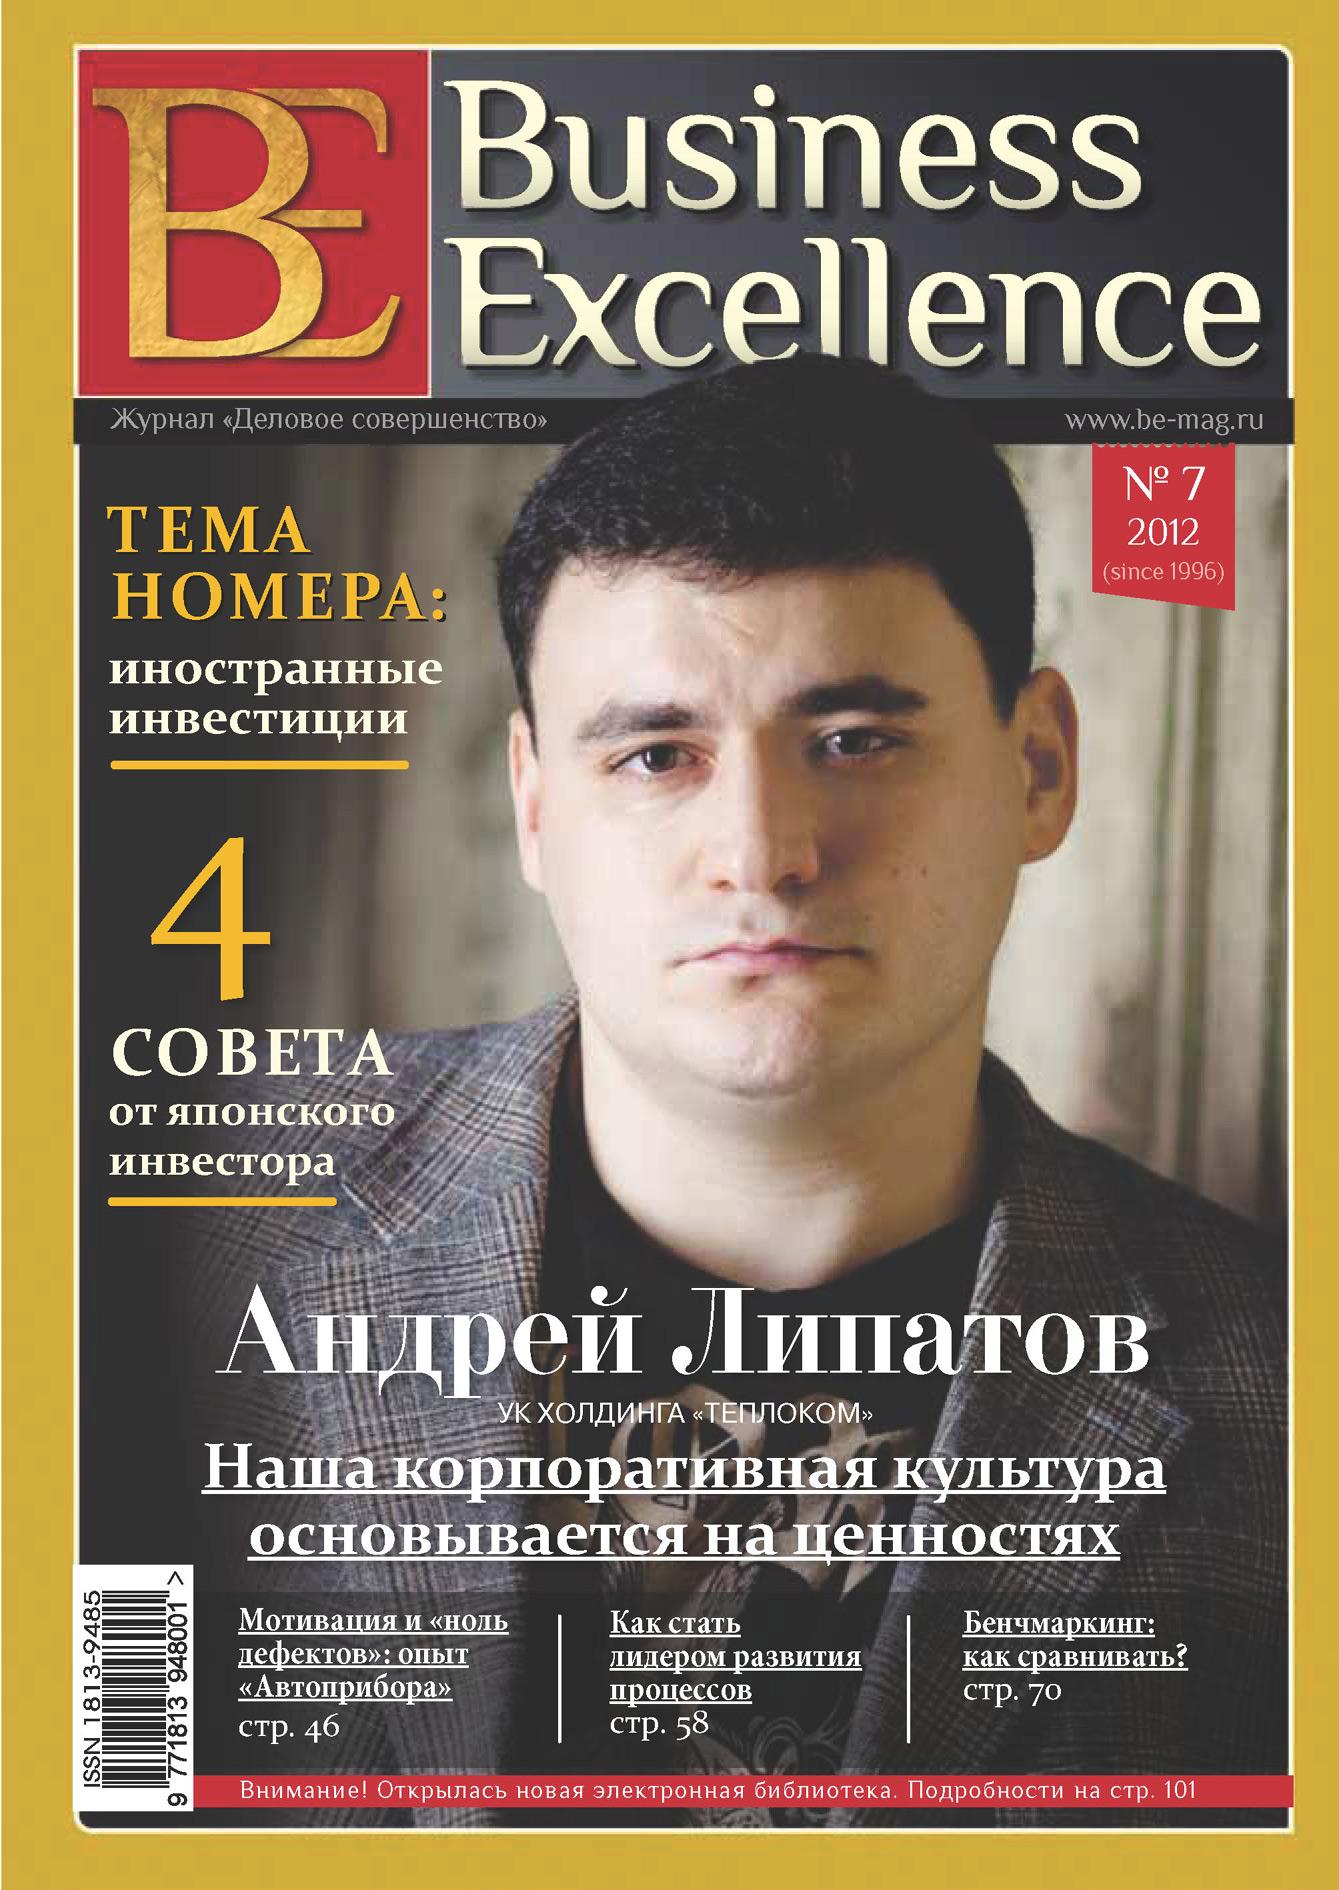 Business Excellence (Деловое совершенство) № 7 (169) 2012